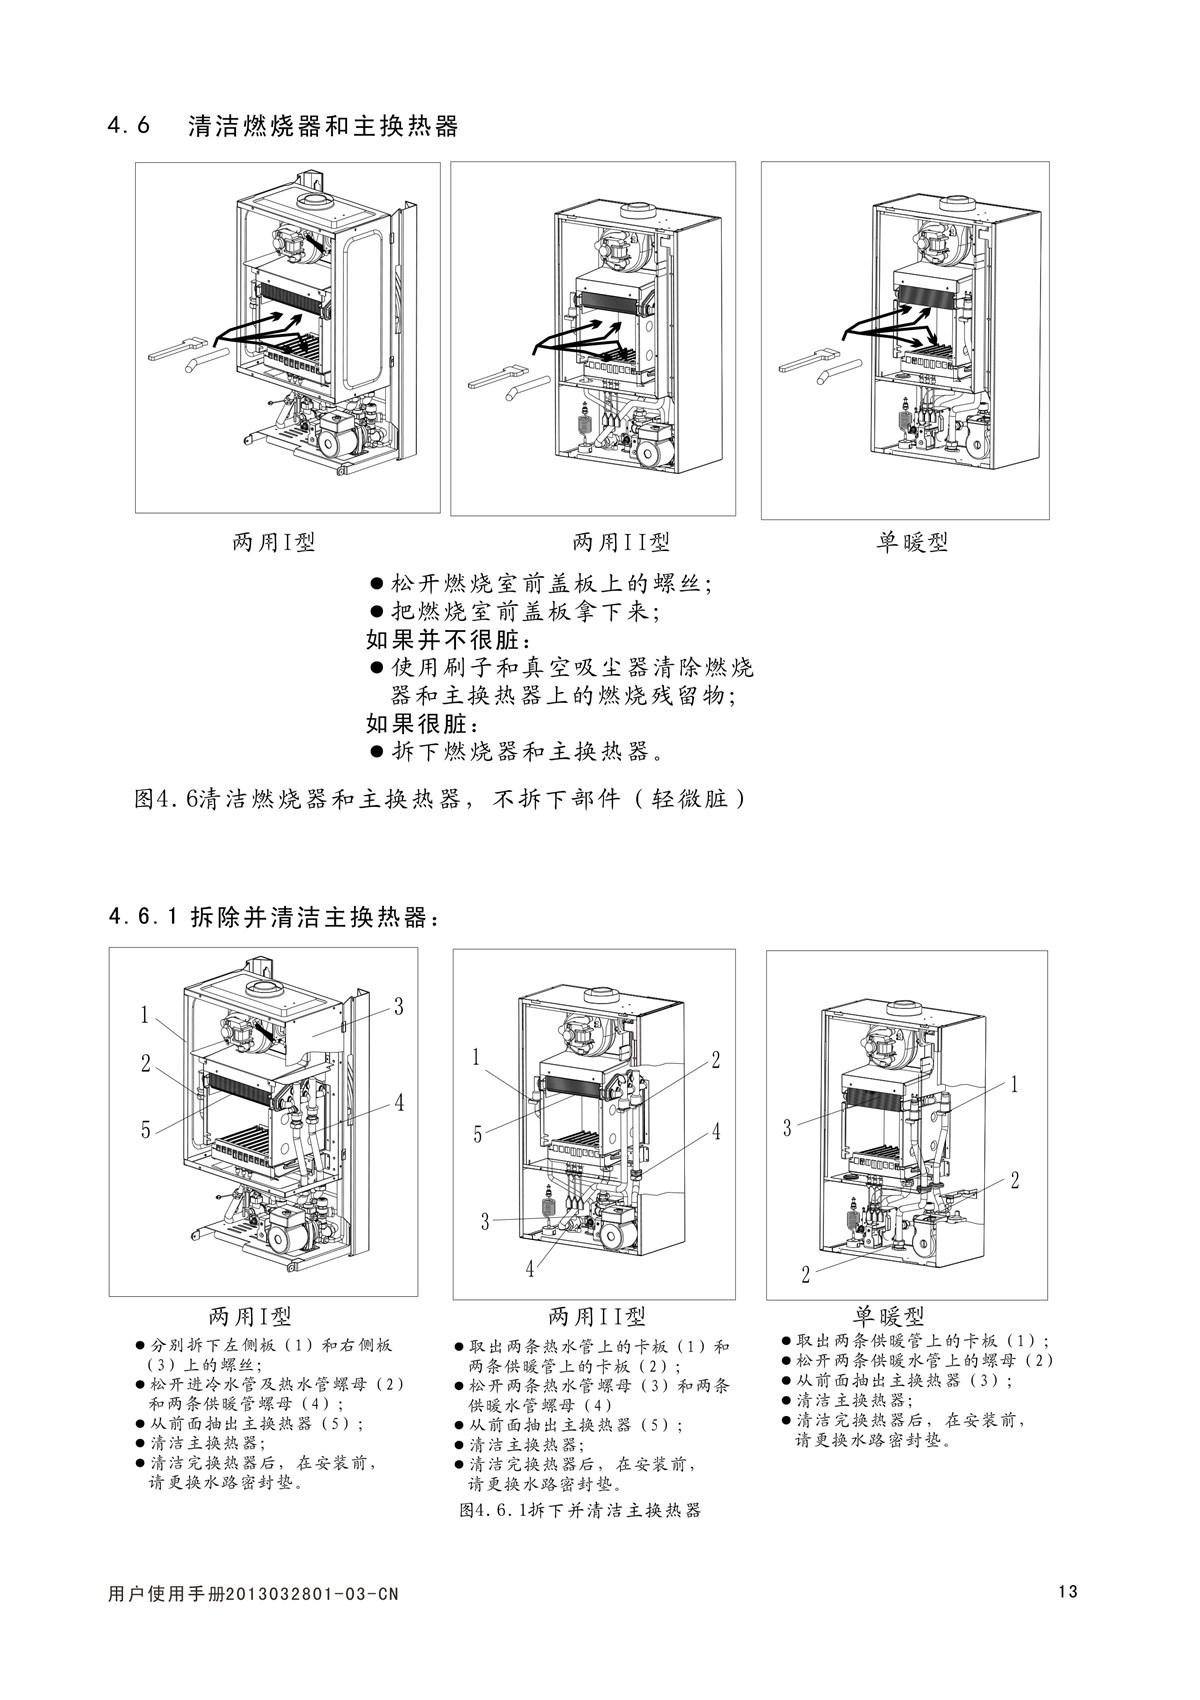 ES16A系列-用户使用手册-5_02.jpg